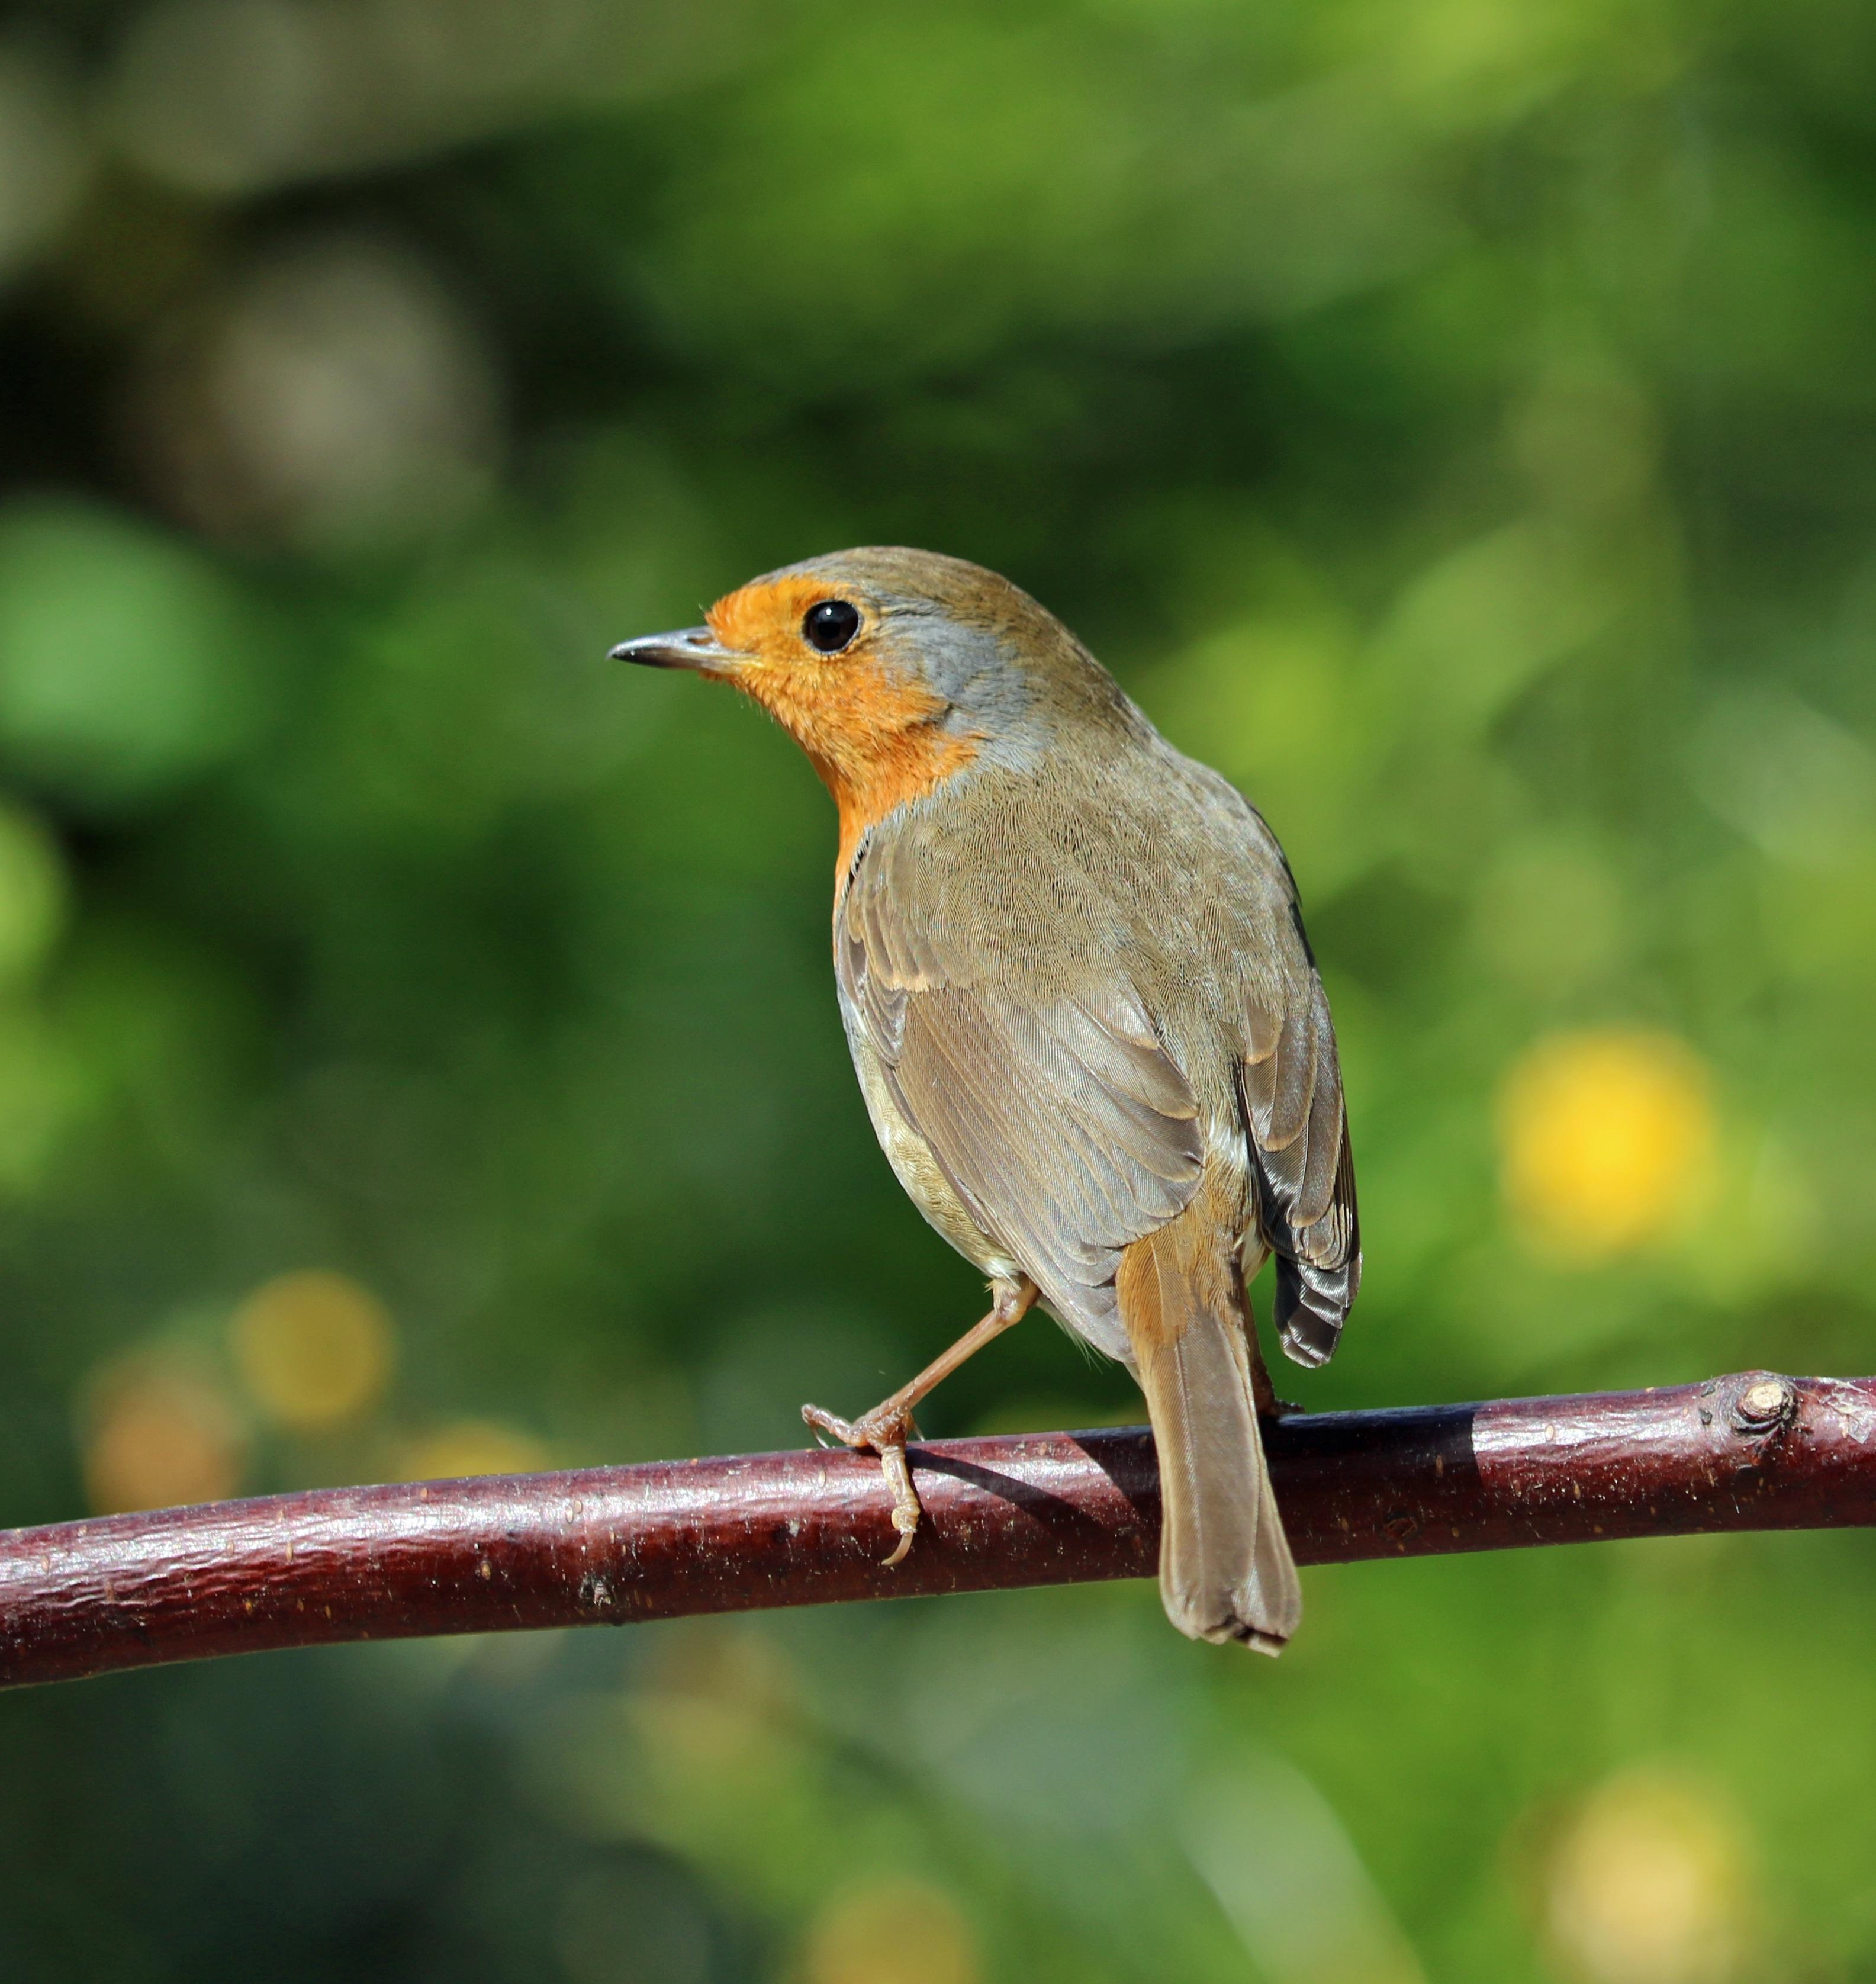 Free Images : nature, branch, wildlife, red, beak, fauna ...